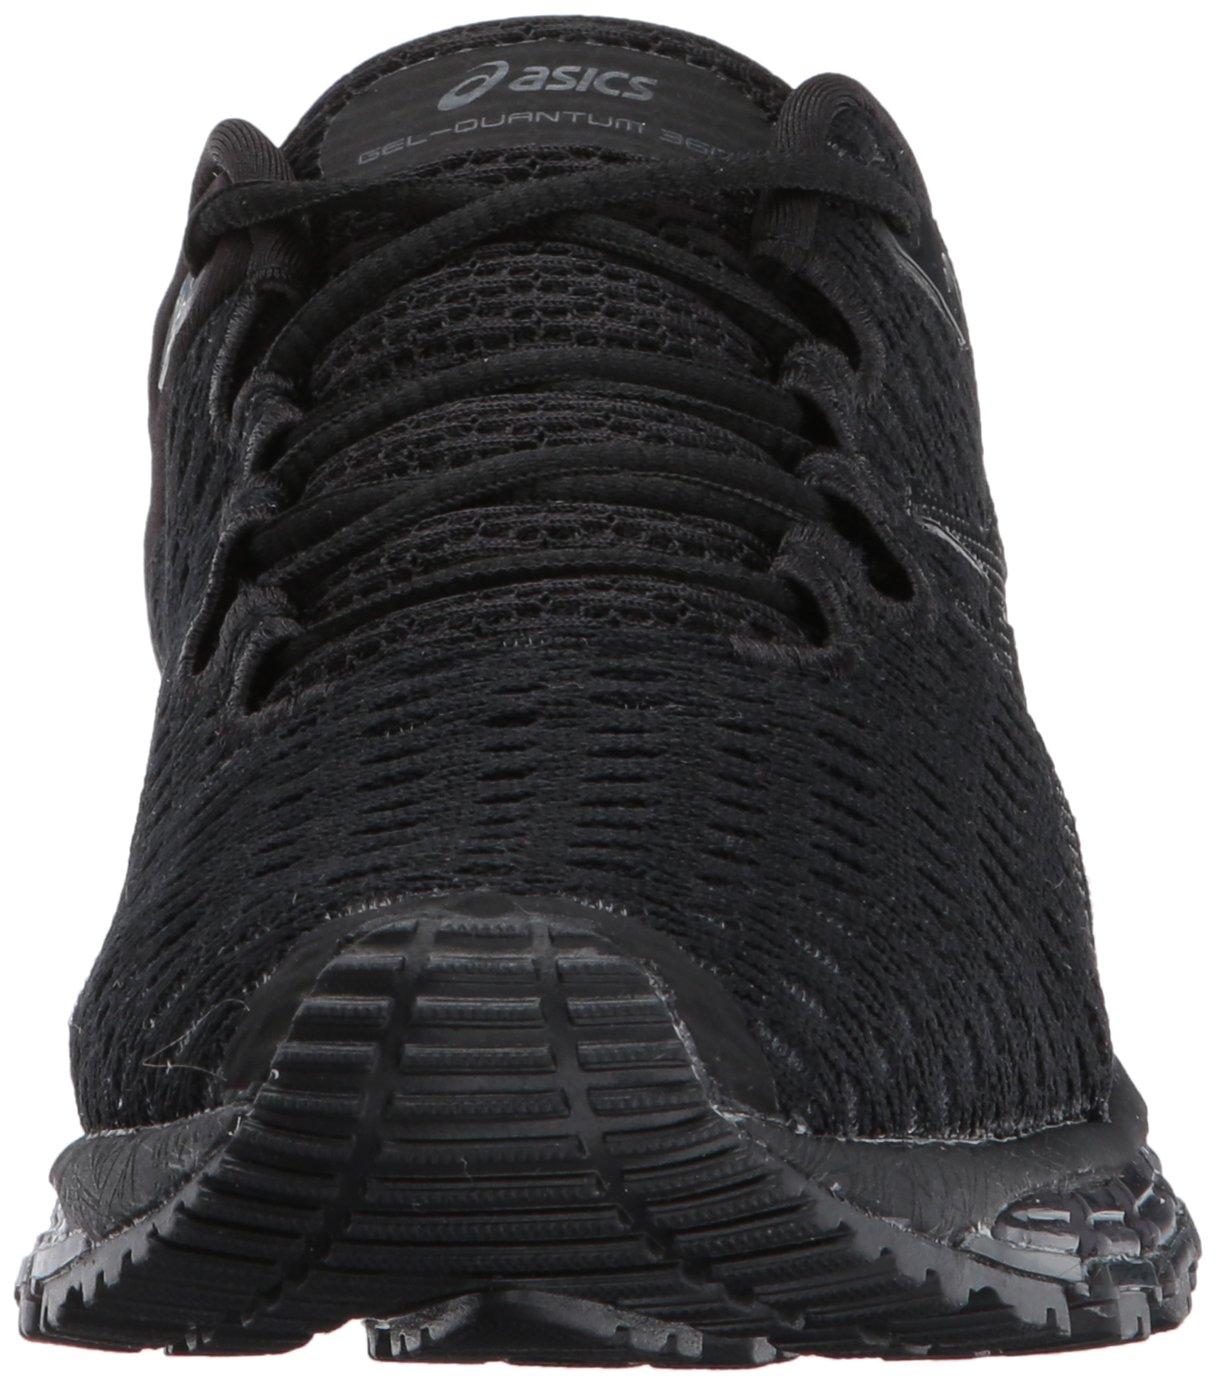 ASICS Women's Shoe Gel-Quantum 360 Shift Running Shoe Women's B01N1URR4M 5 B(M) US|Black/Black/White b2cd75